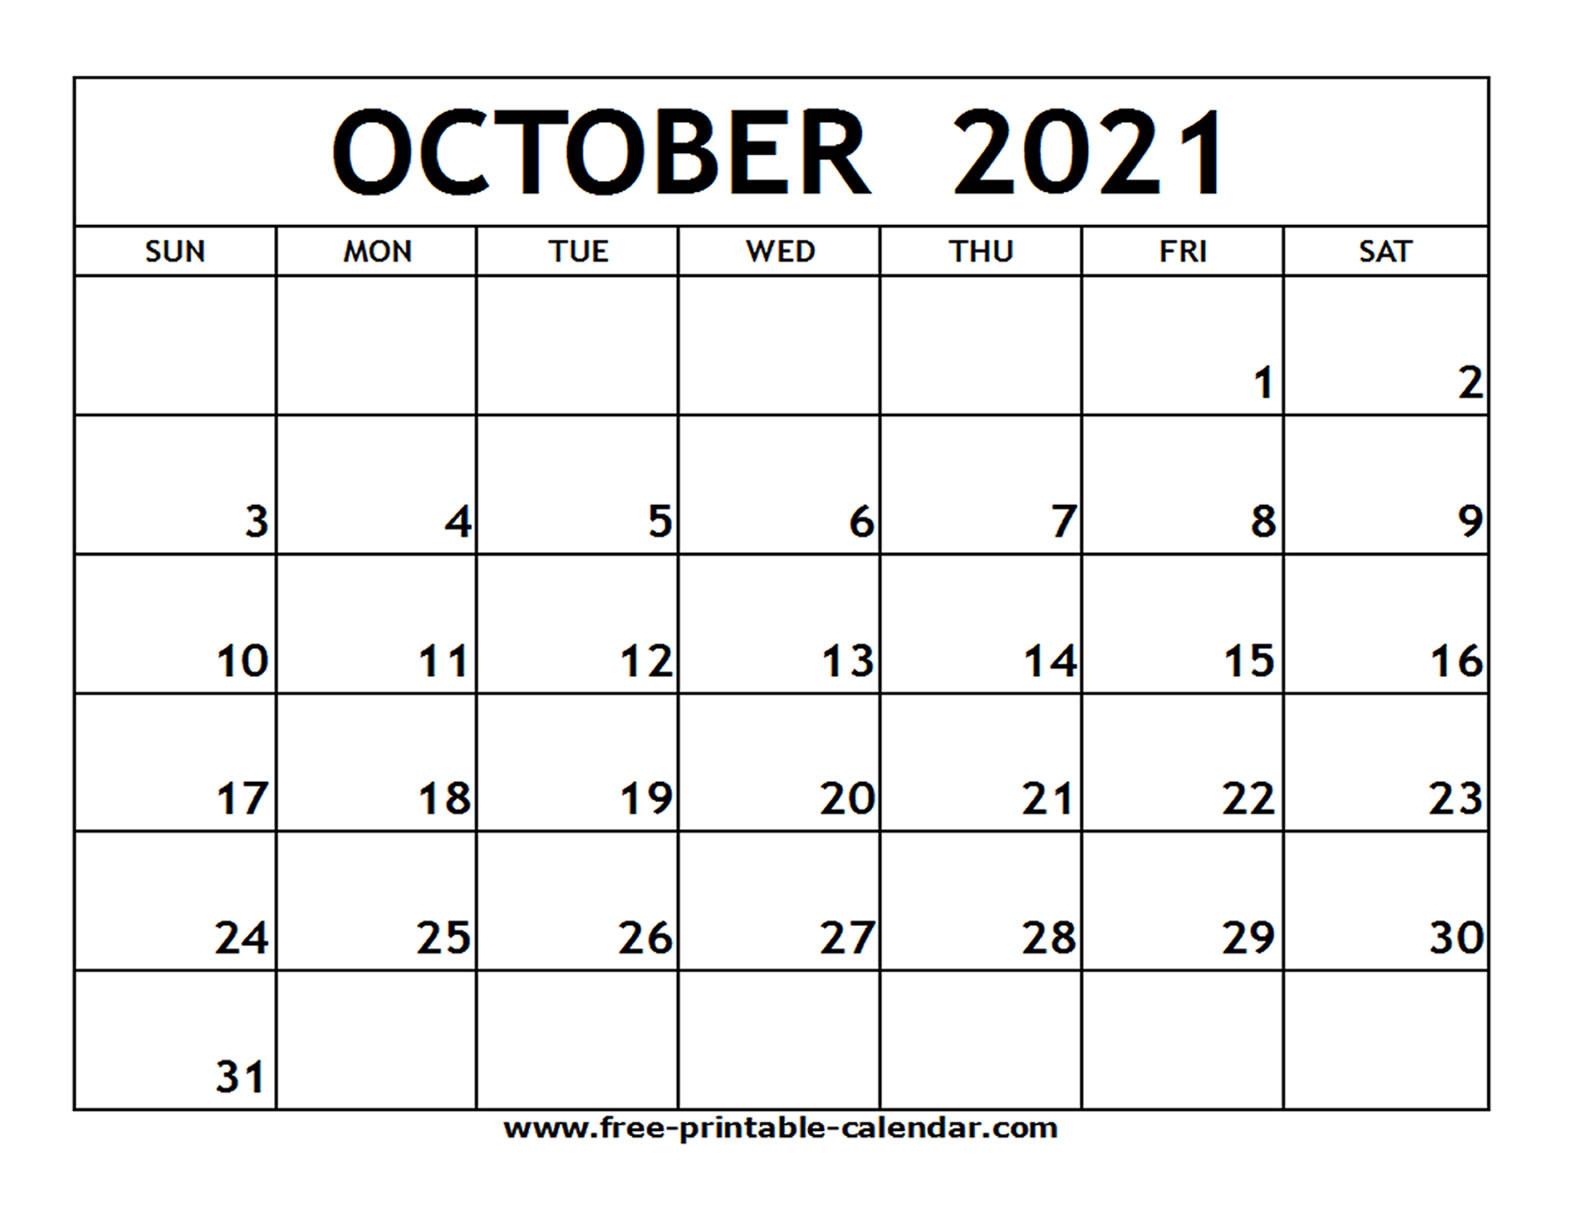 October 2021 Calendar Free Printable   2021 Printable  Free Blank Printable Monthly Calendar 2021